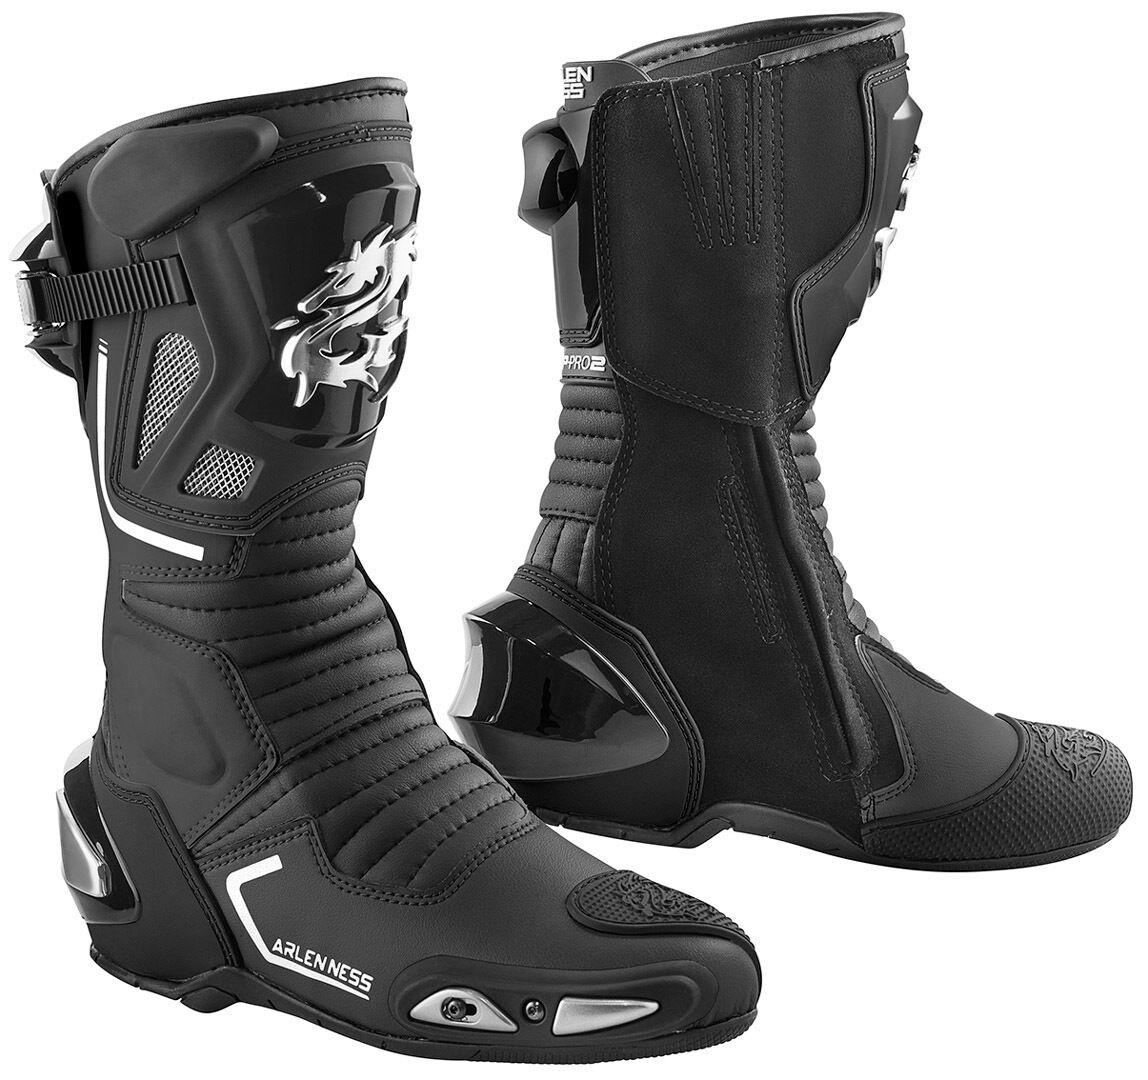 Arlen Ness Sugello Bottes de moto Noir taille : 43